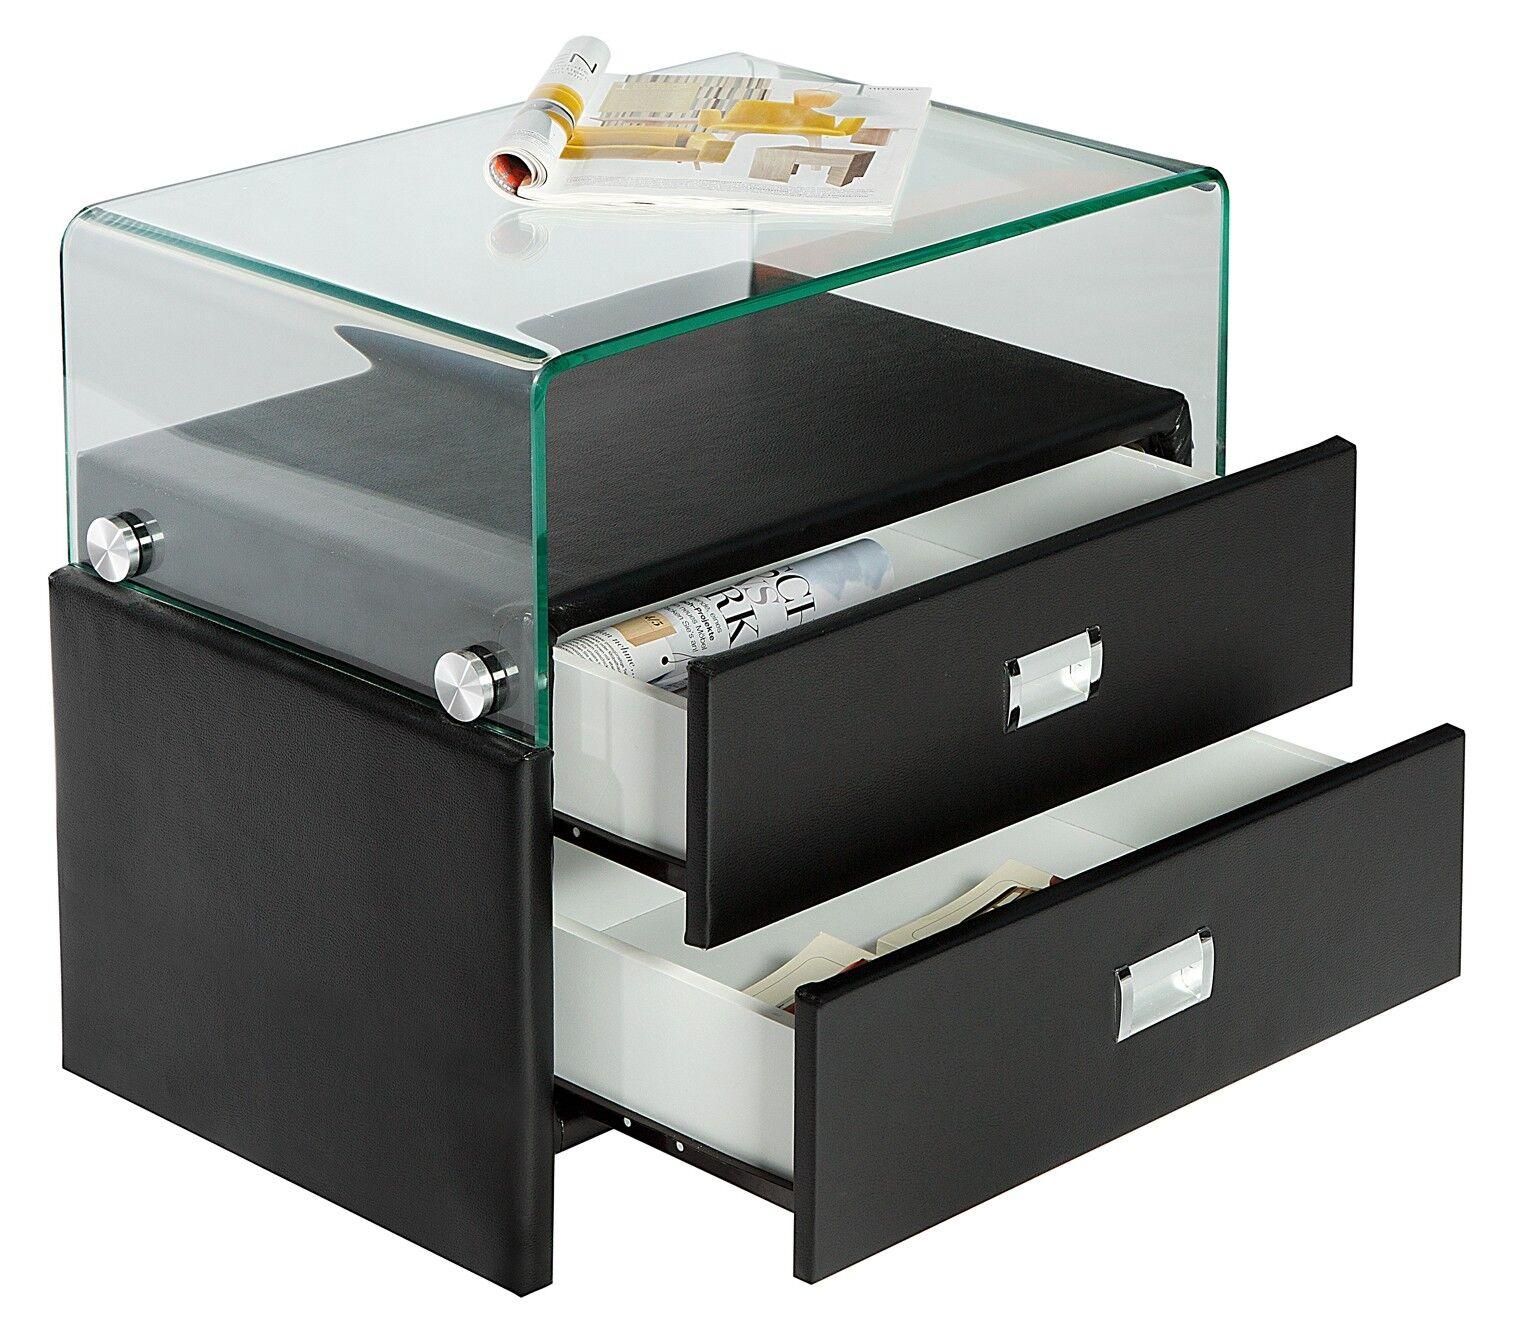 gdegdesign Chevet design simili cuir noir et verre 2 tiroirs - Stan